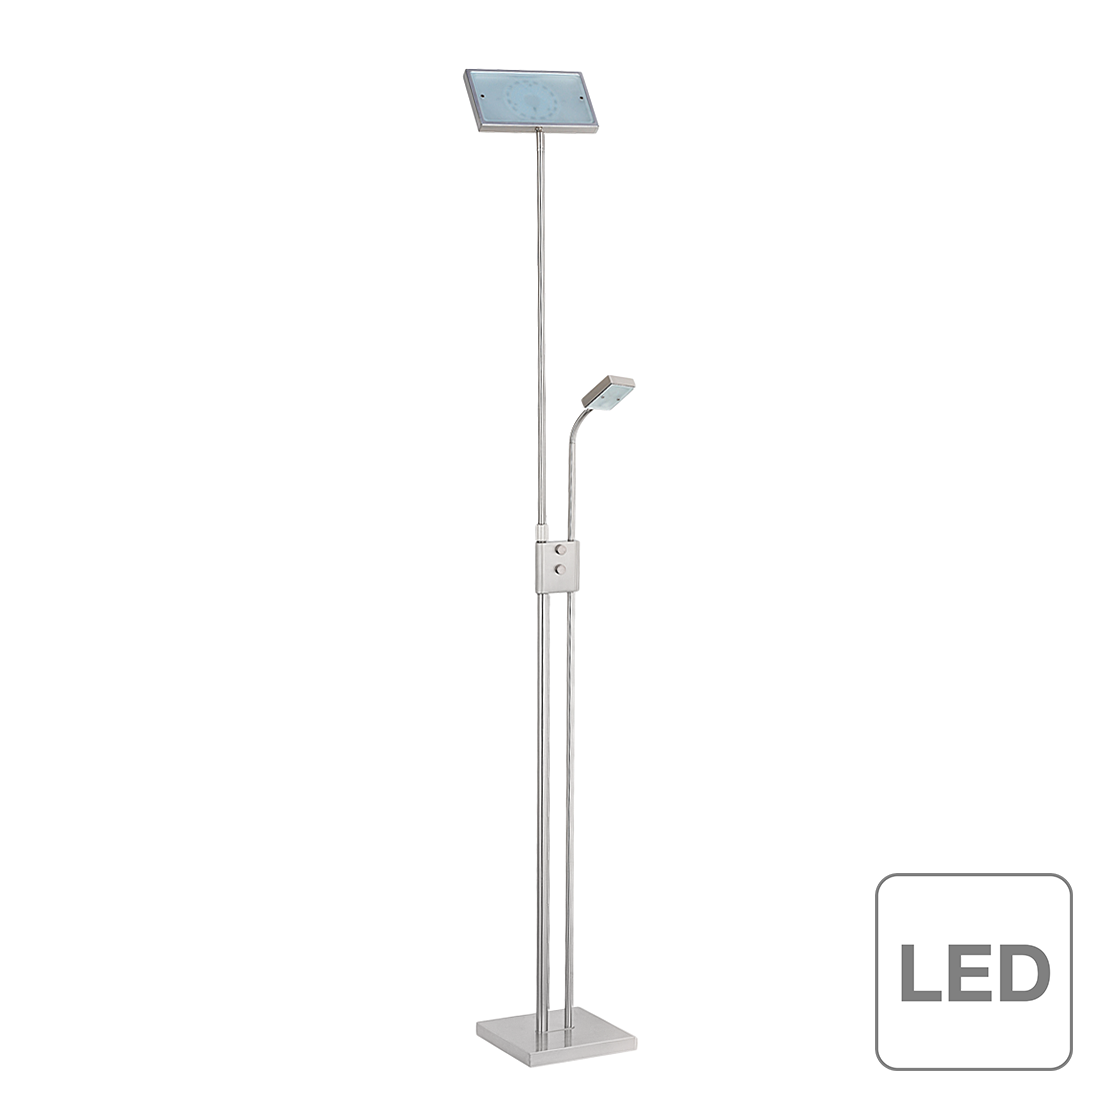 brilliant lampadaire led avec lampe de lecture sunniva 19 w. Black Bedroom Furniture Sets. Home Design Ideas